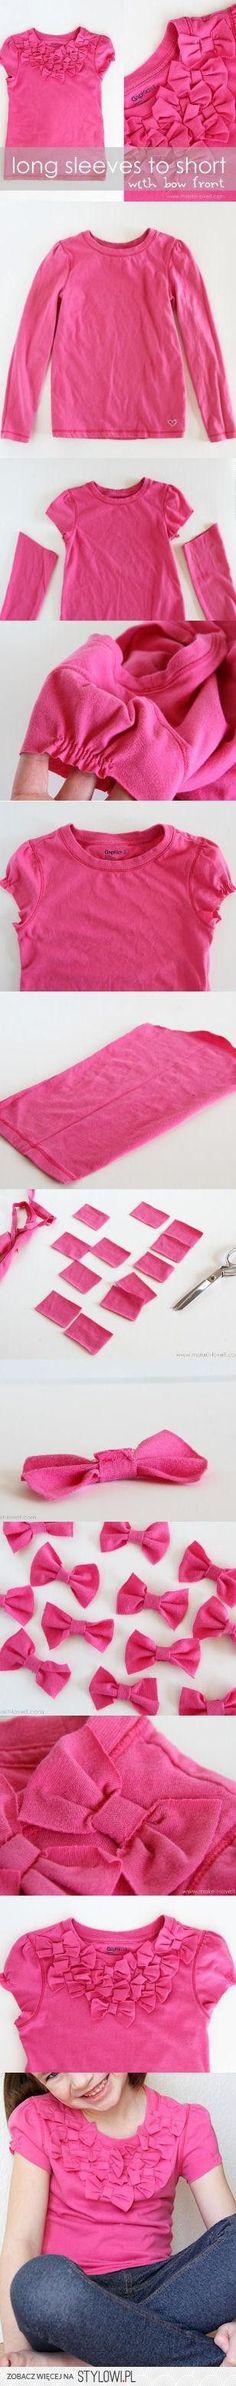 27 Useful Fashionable DIY Ideas, DIY:   http://cartoonphotocollections.blogspot.com